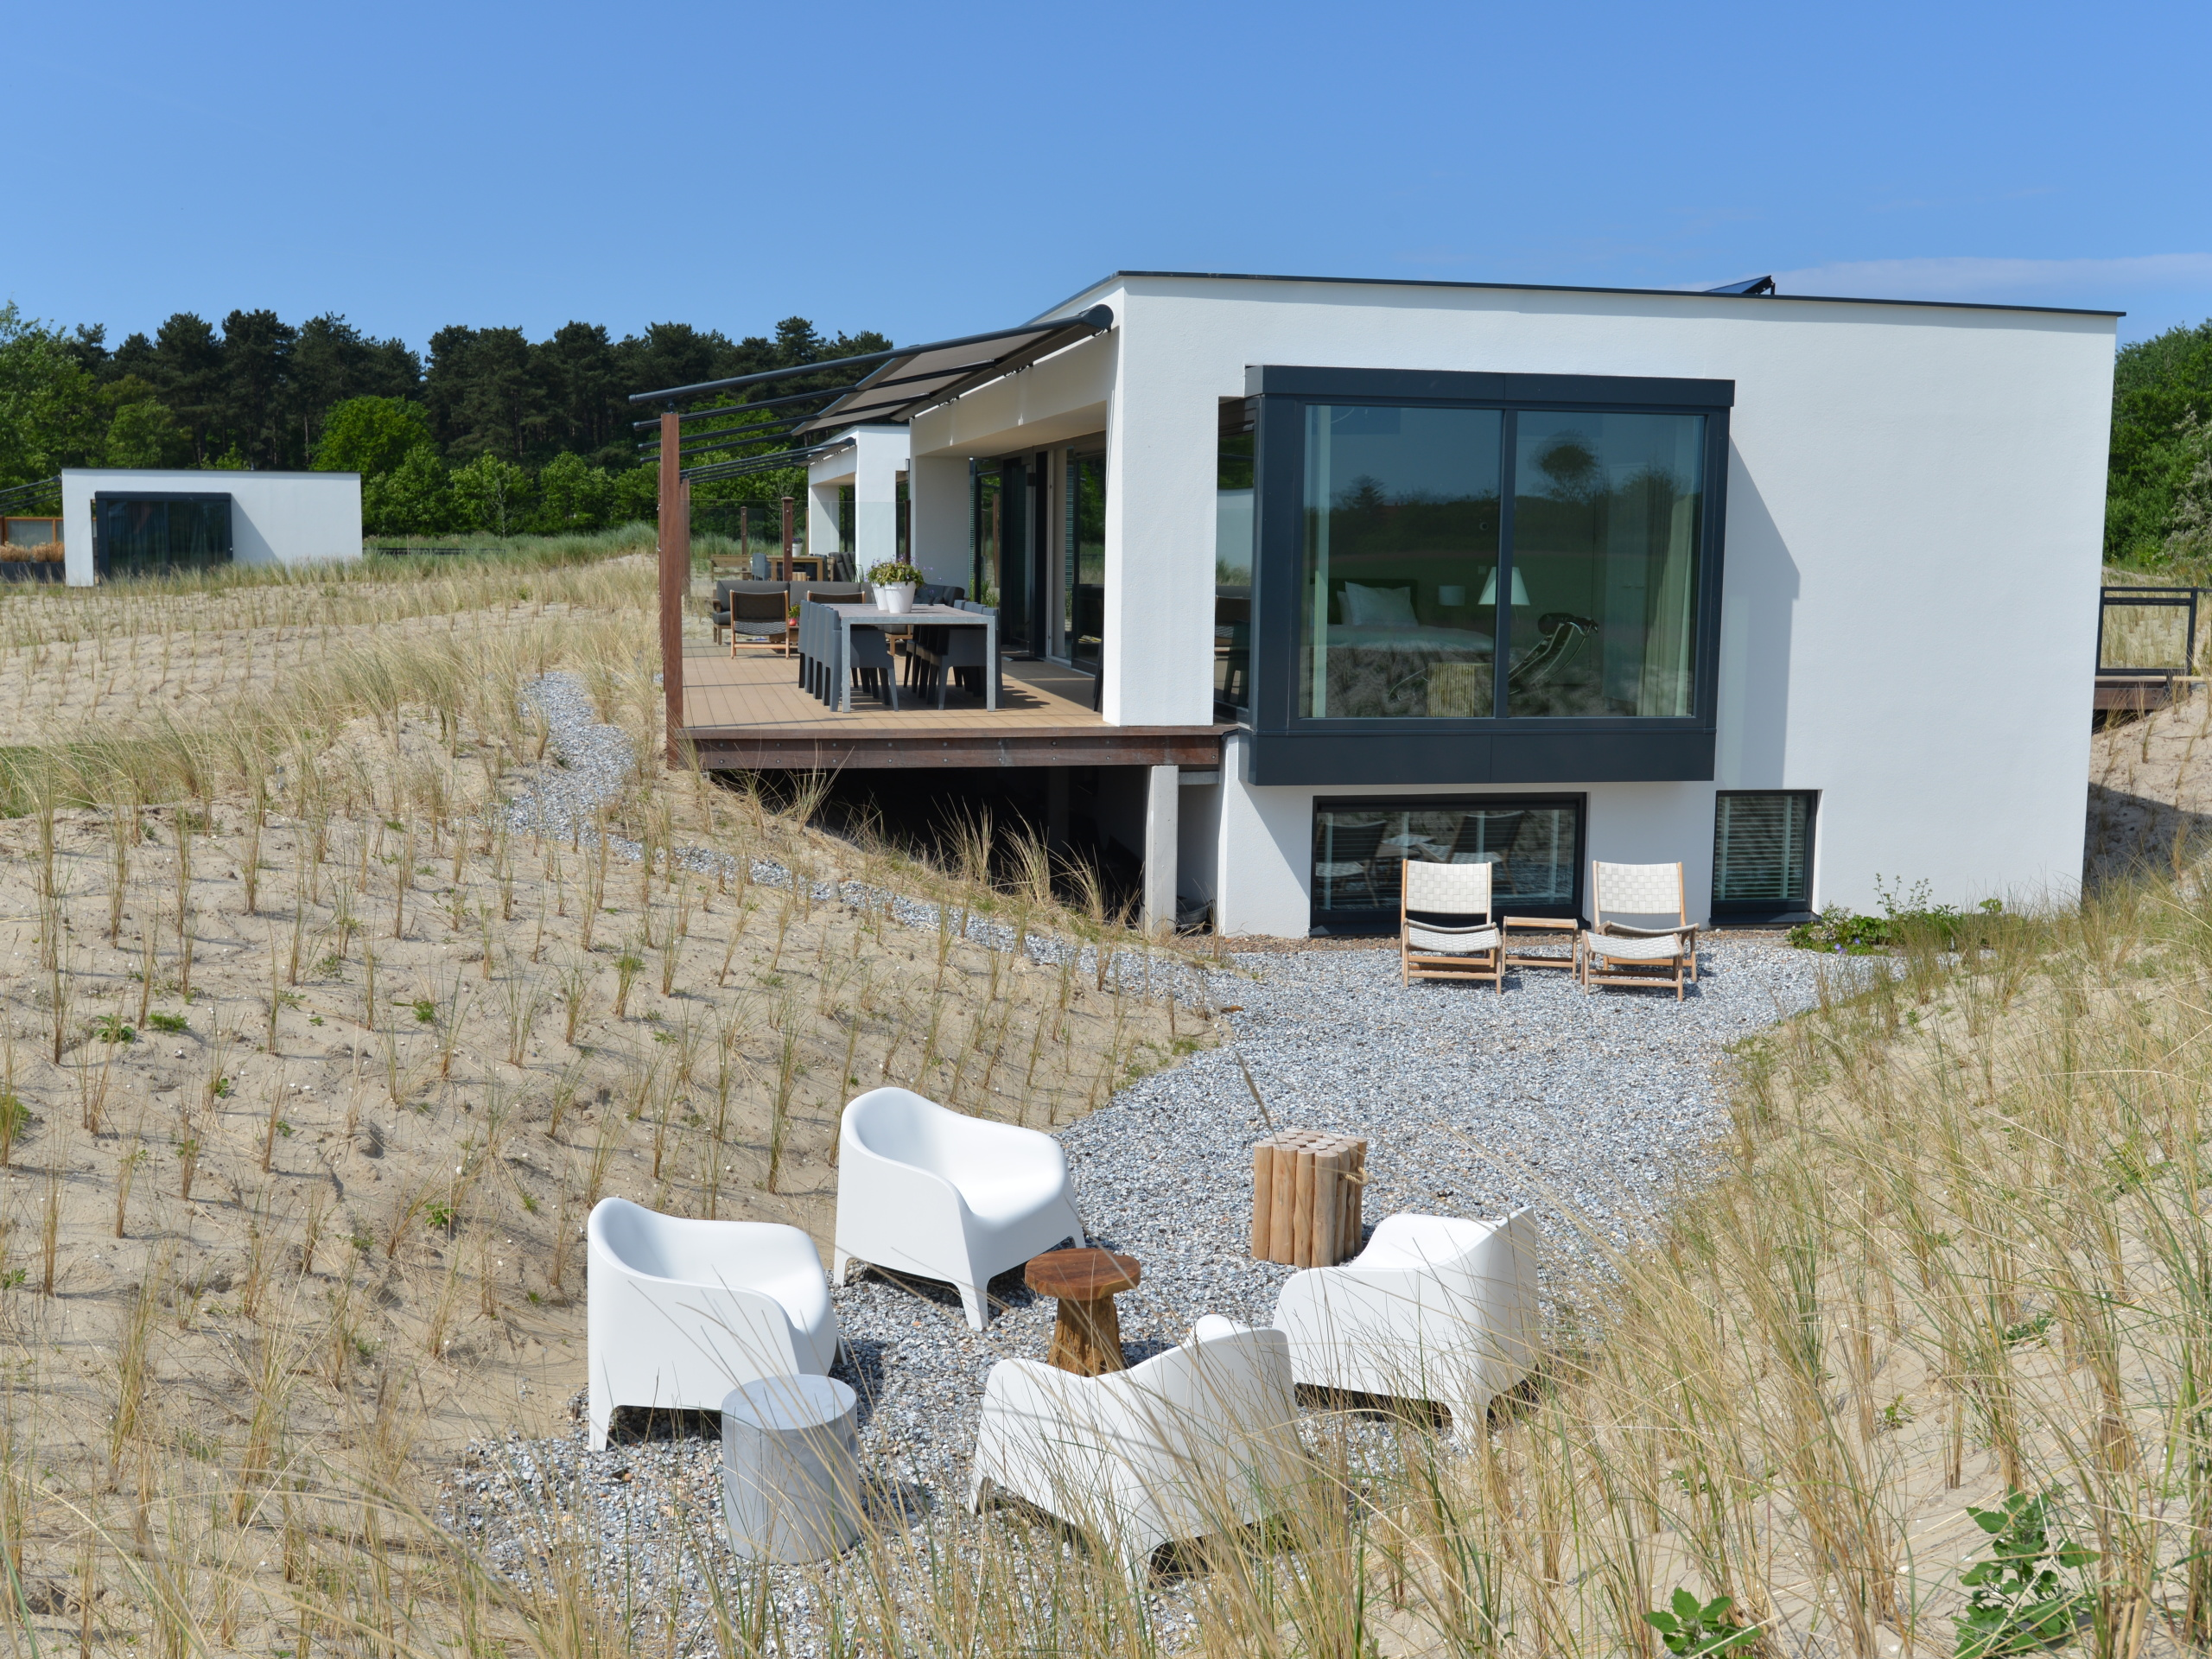 Exclusive detached luxury villa with sauna in forest De Dennen